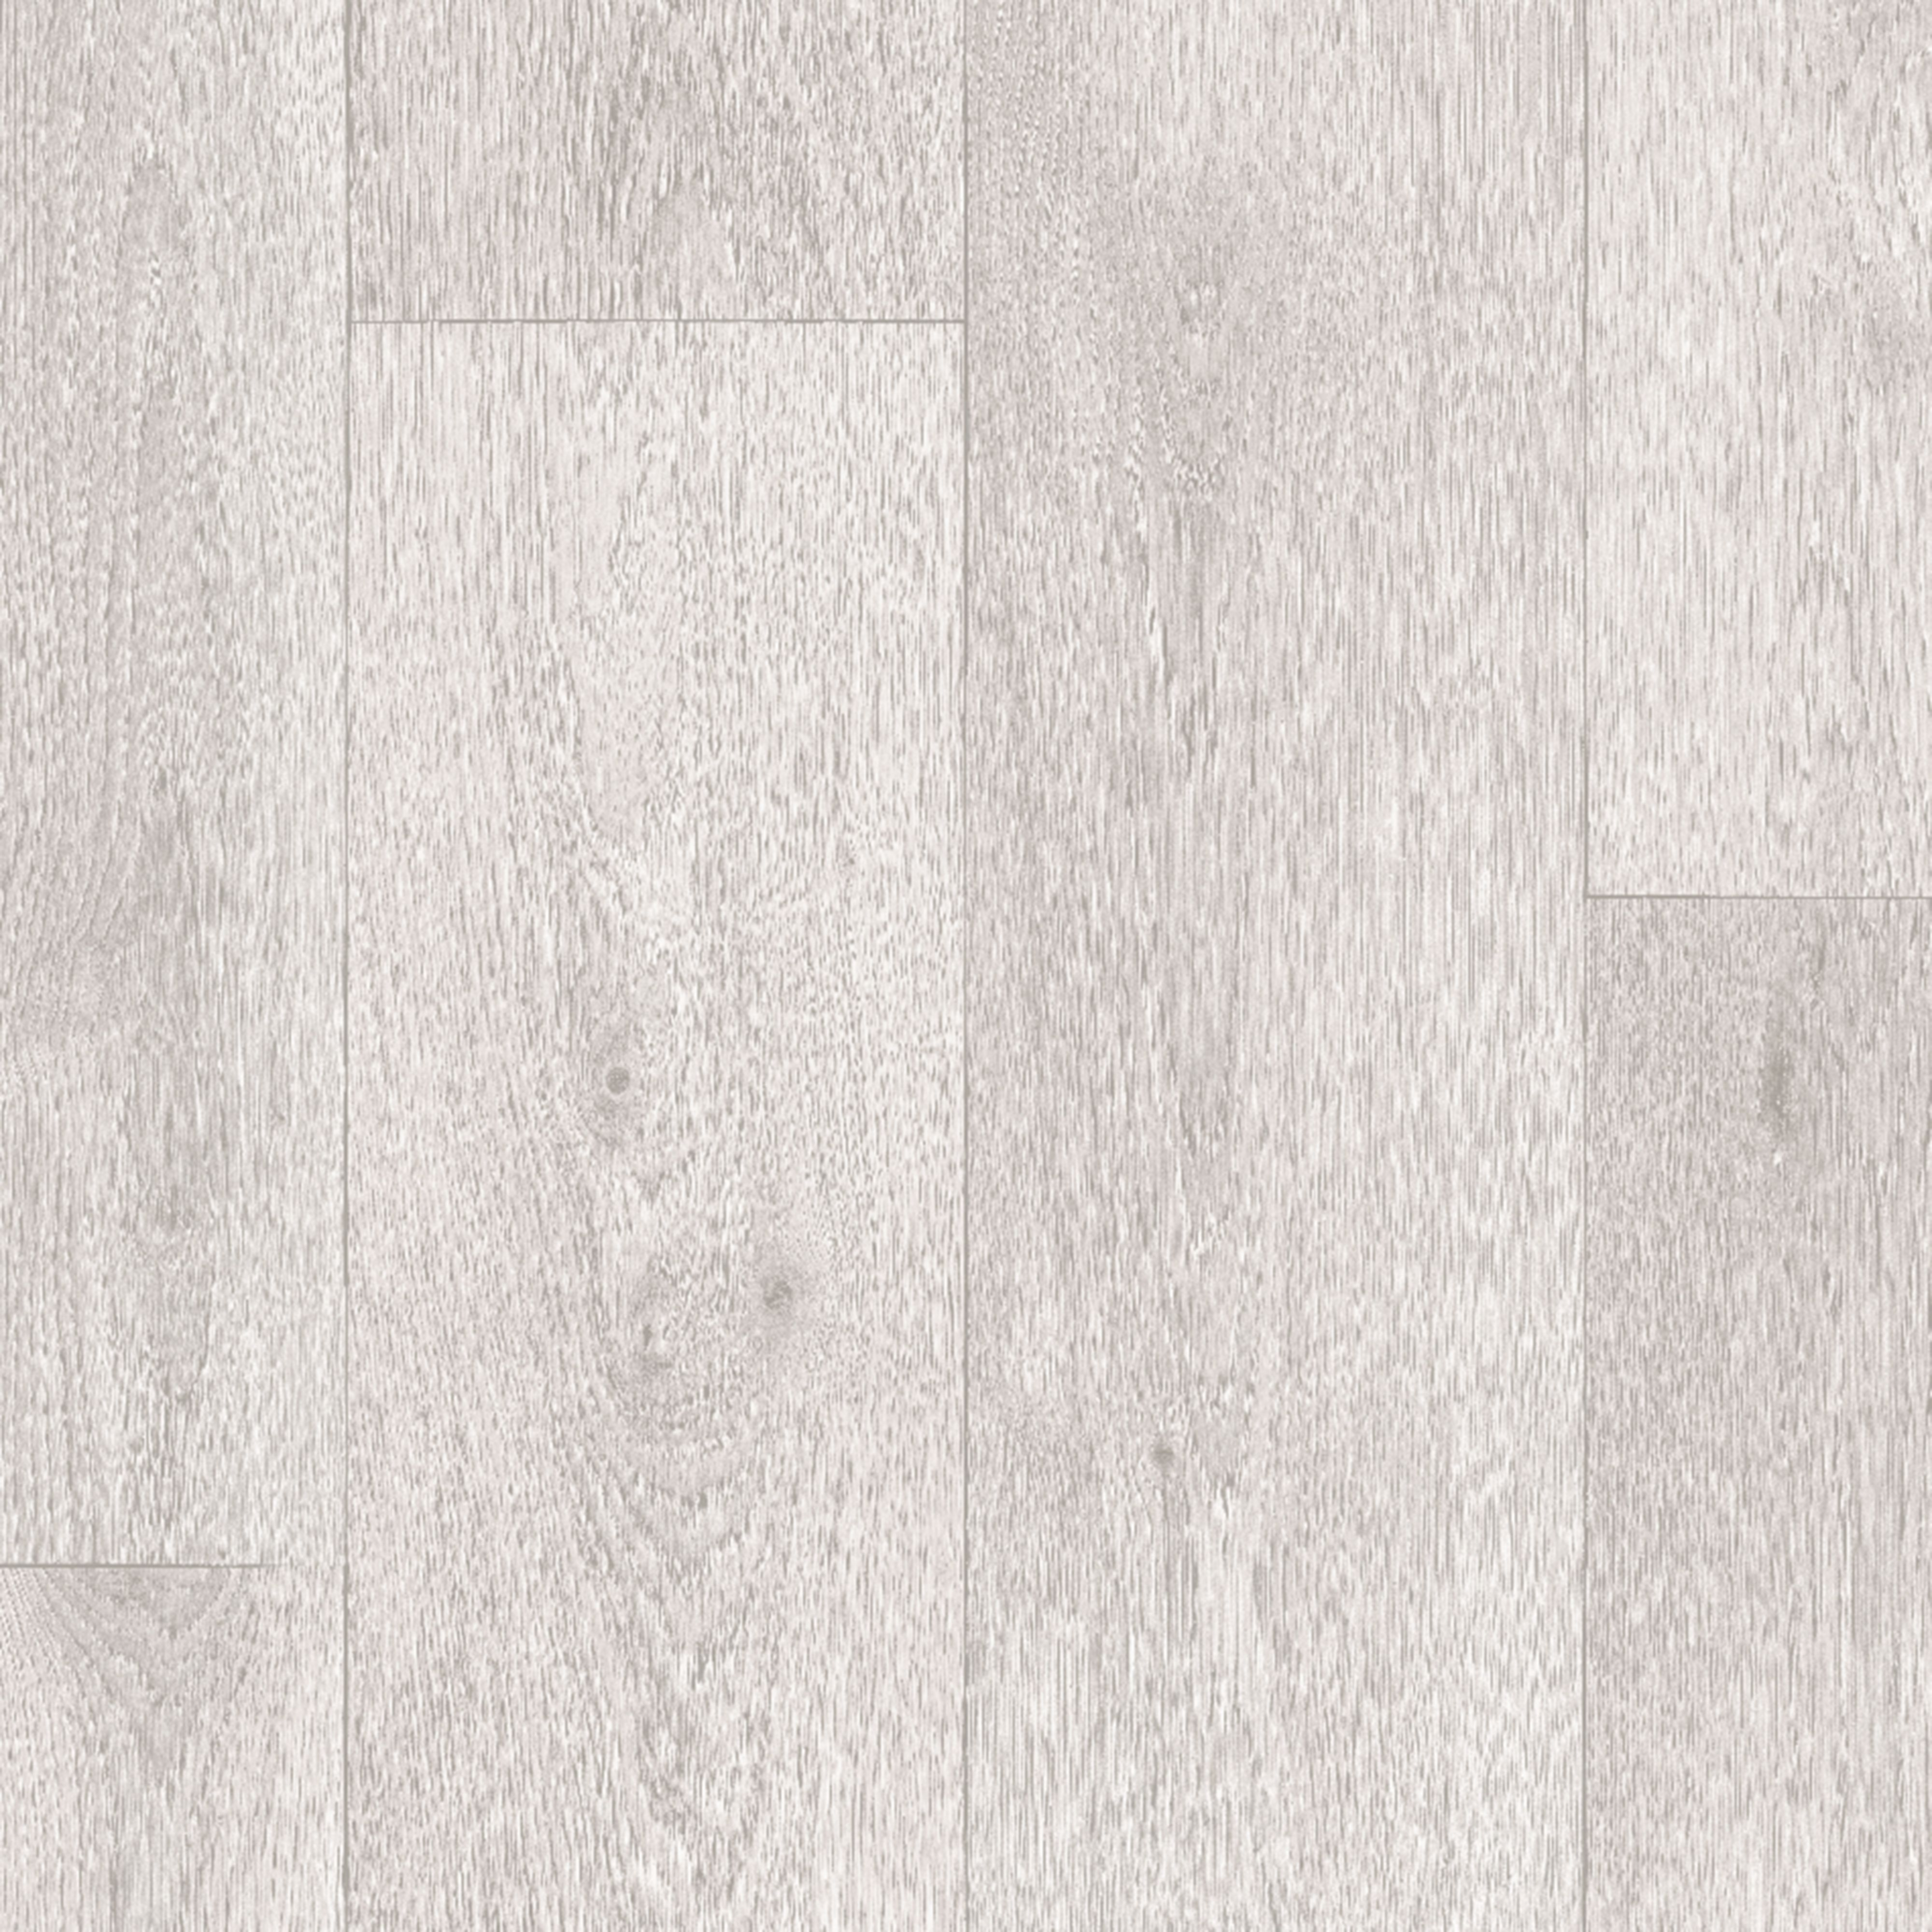 Dolcedo black stone tile effect vinyl cut to chosen length in store dolcedo black stone tile effect vinyl cut to chosen length in store vinyl cutting stone tiles and toilet dailygadgetfo Choice Image